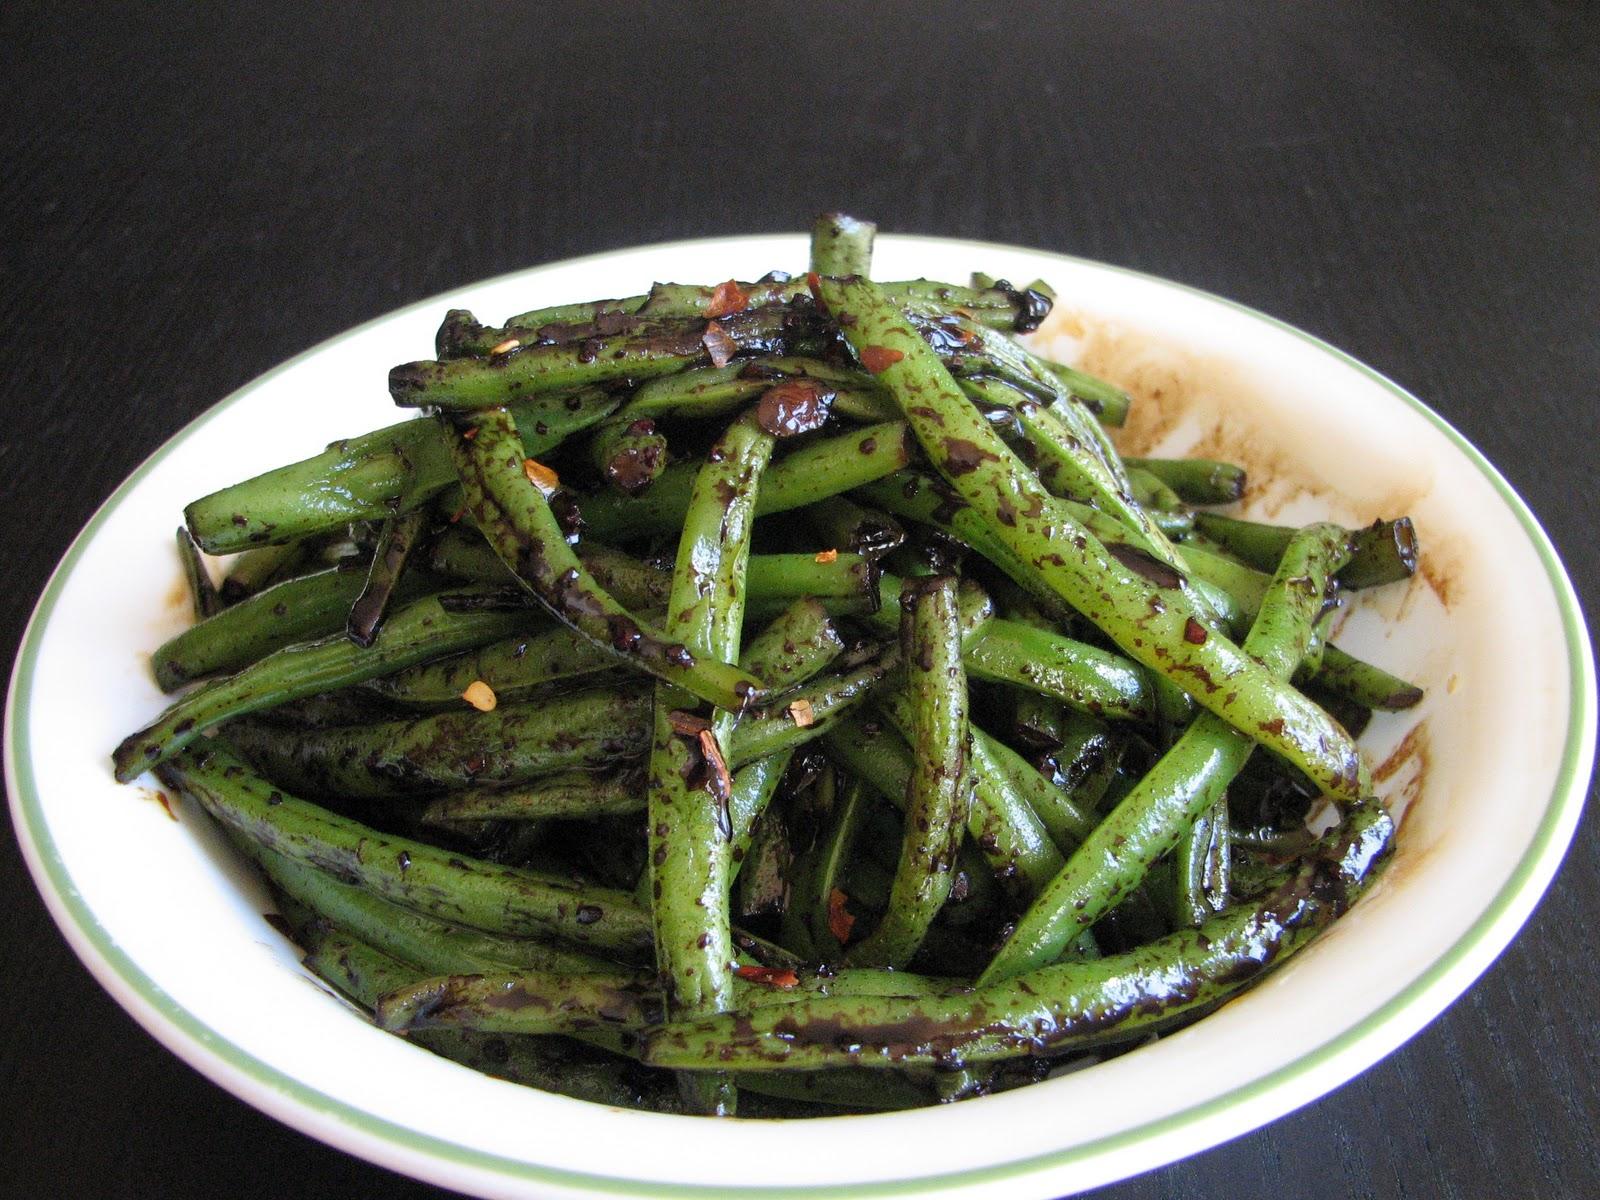 Chicken-Green Bean Yellow Chili Stir-Fry Recipes — Dishmaps